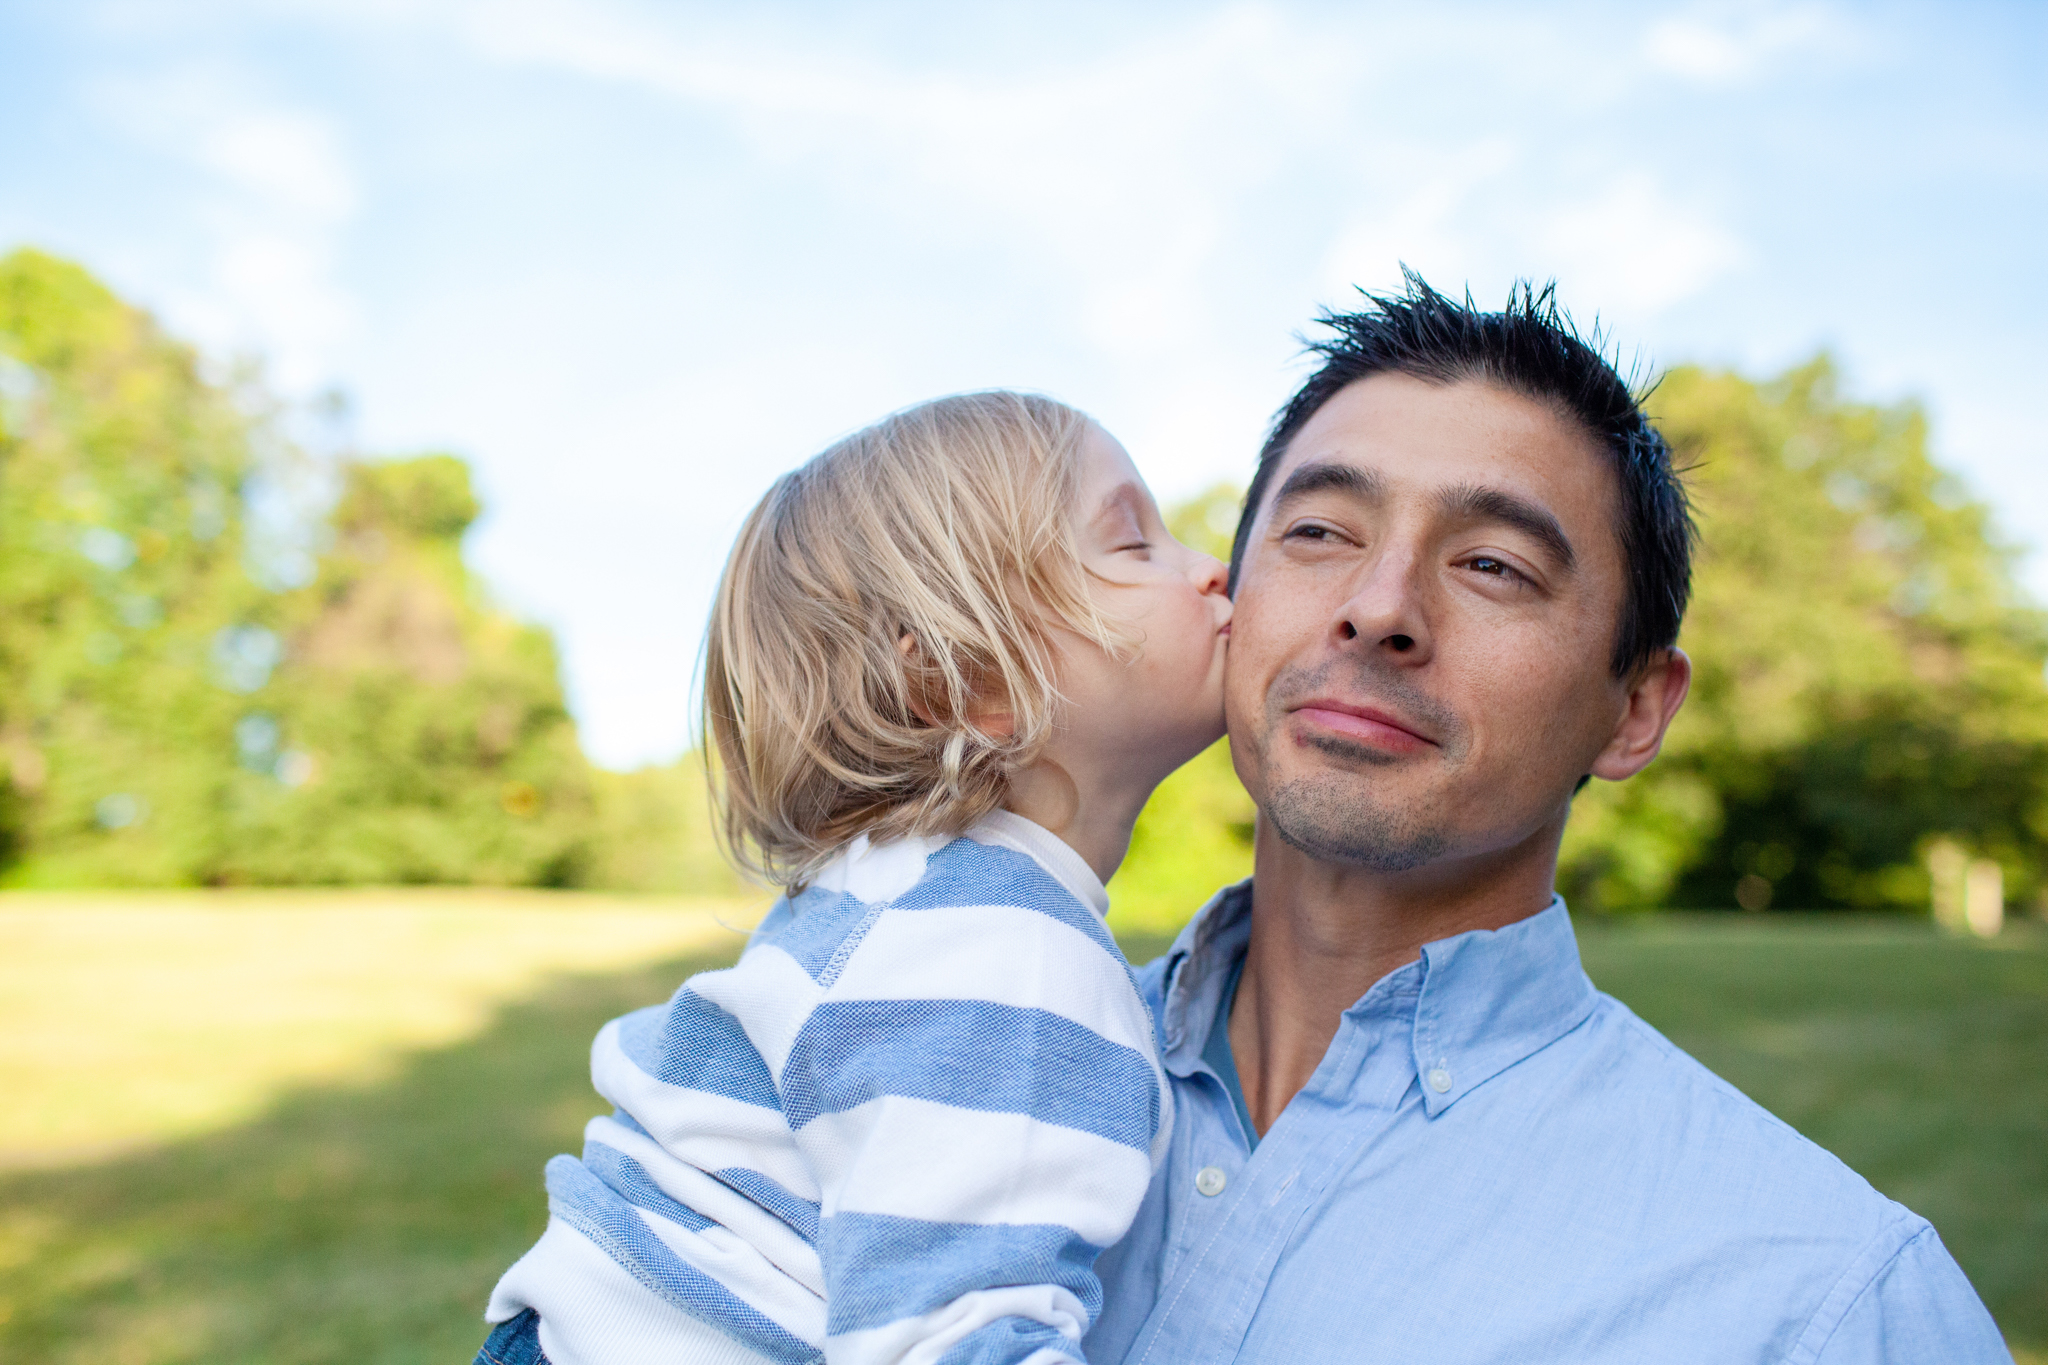 maine-family-photography-stepheneycollinsphotography -68.jpg